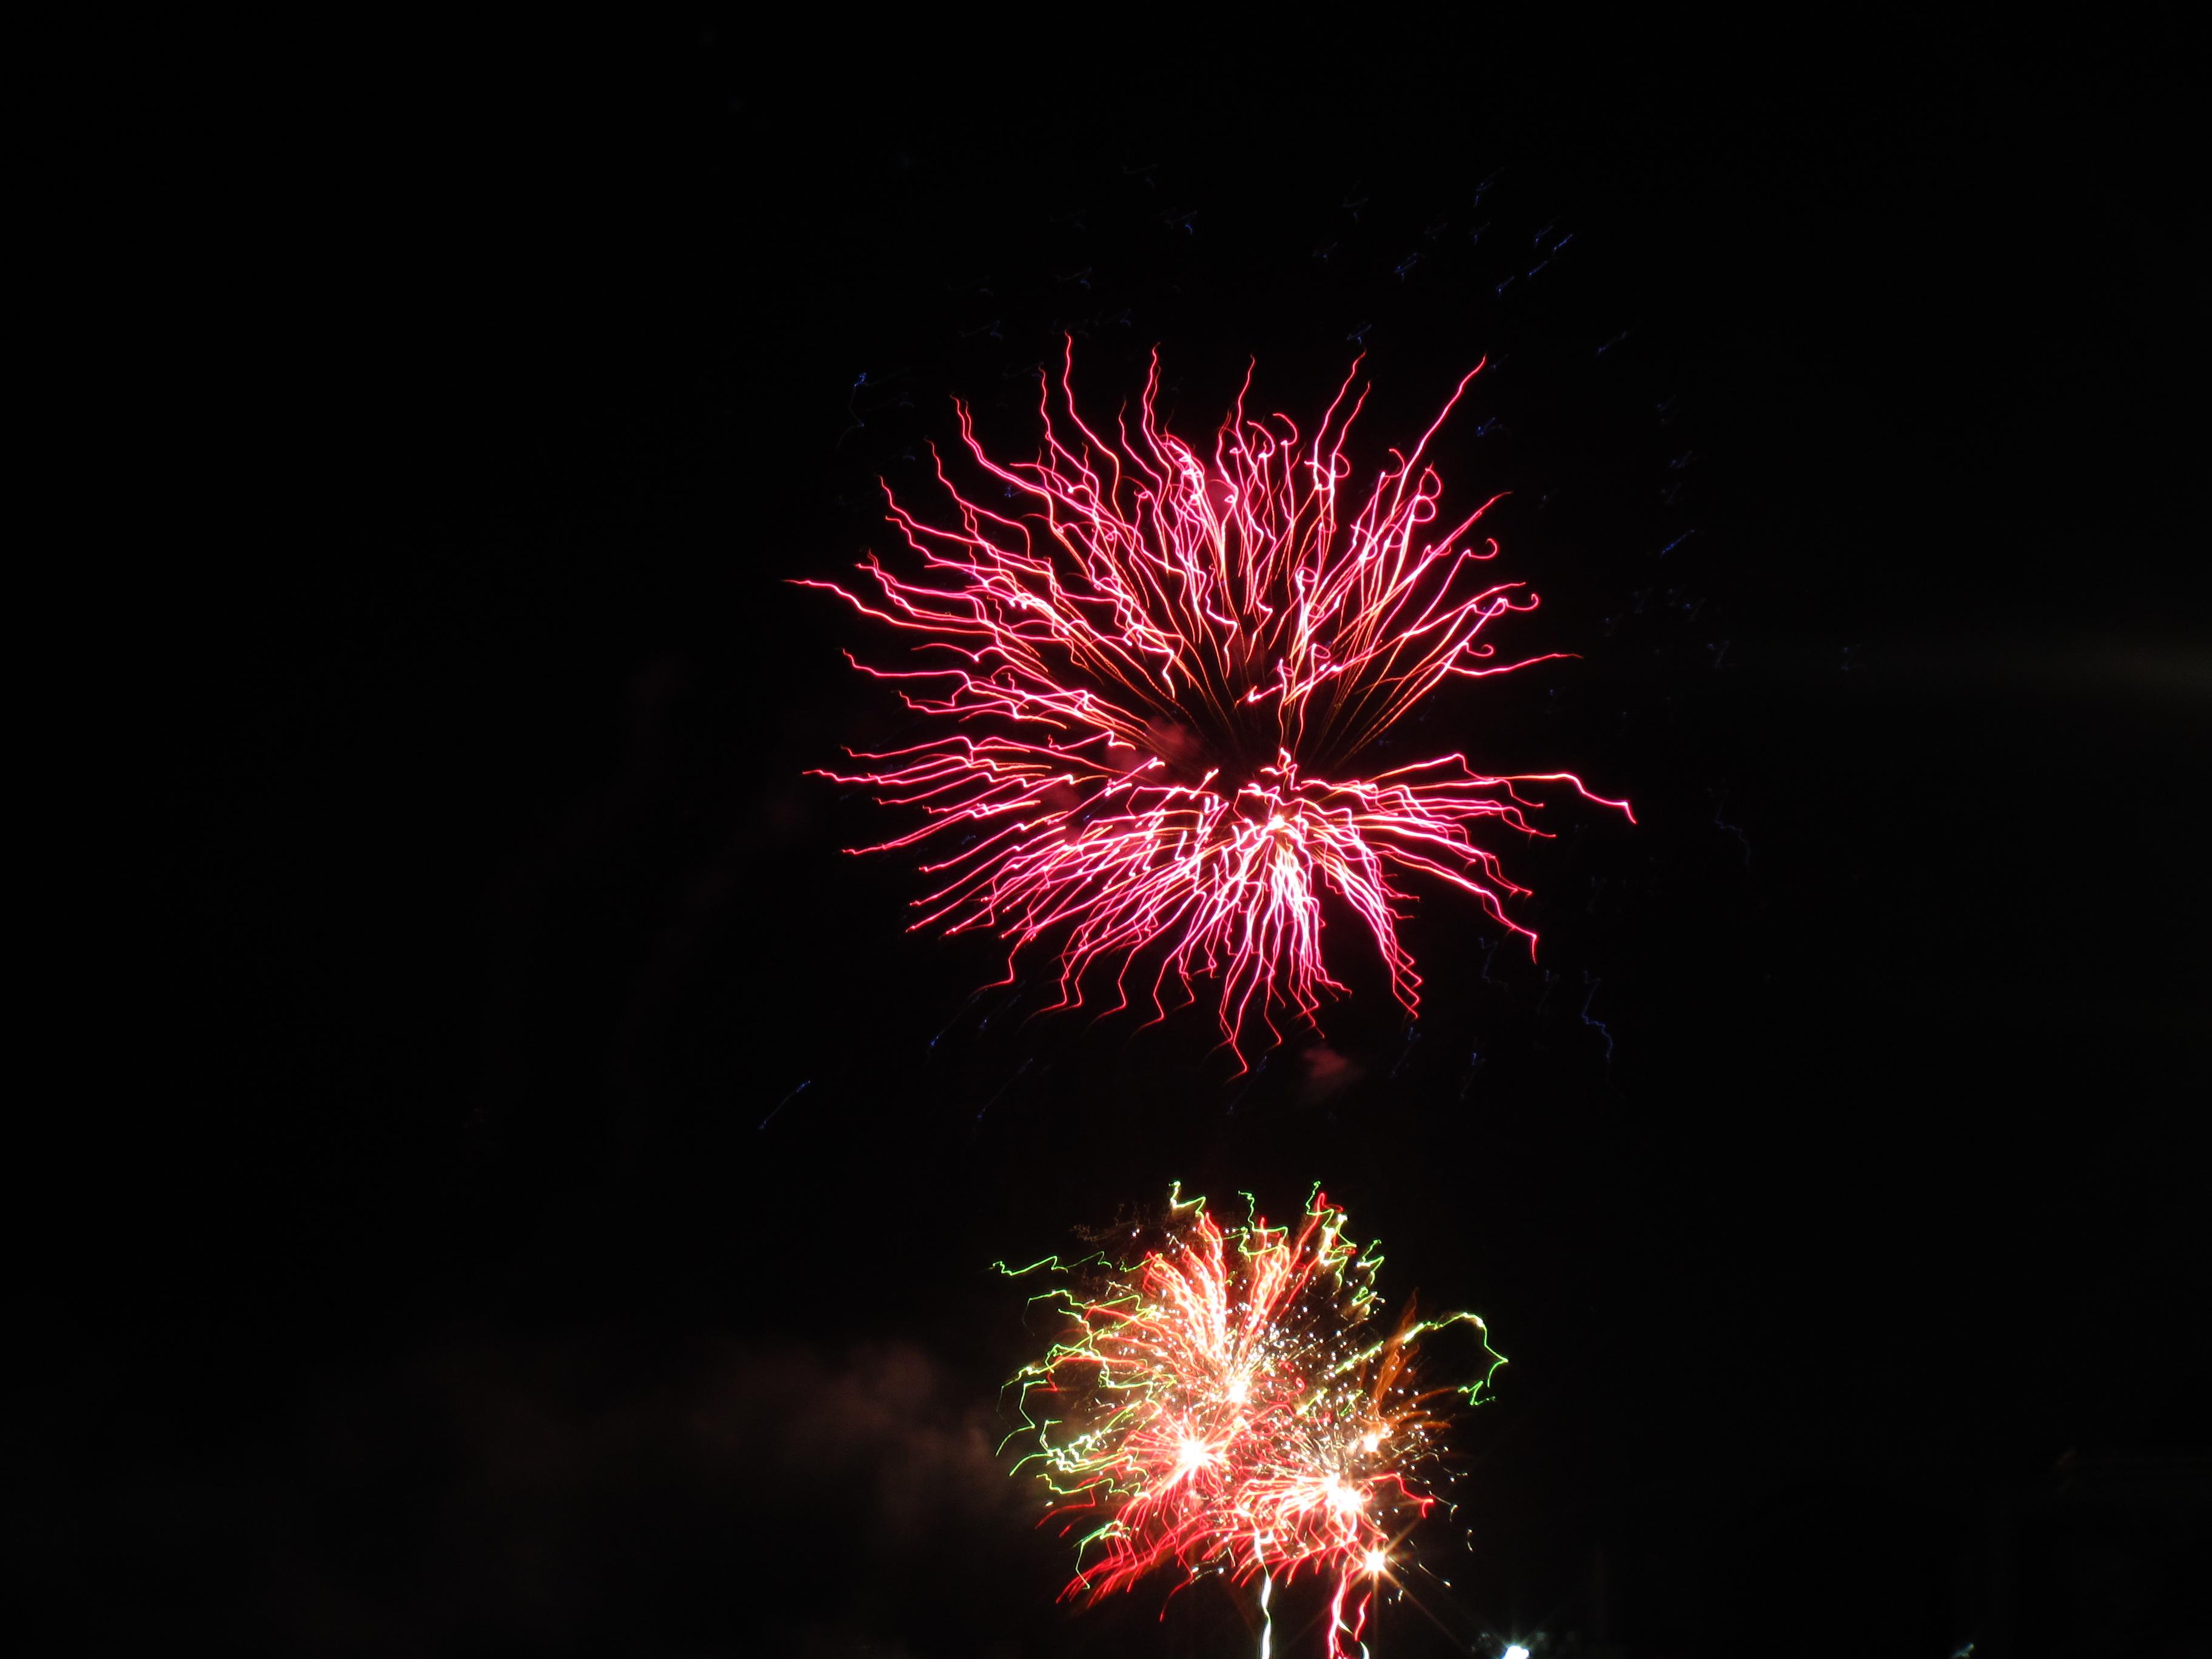 Night sky fireworks photo